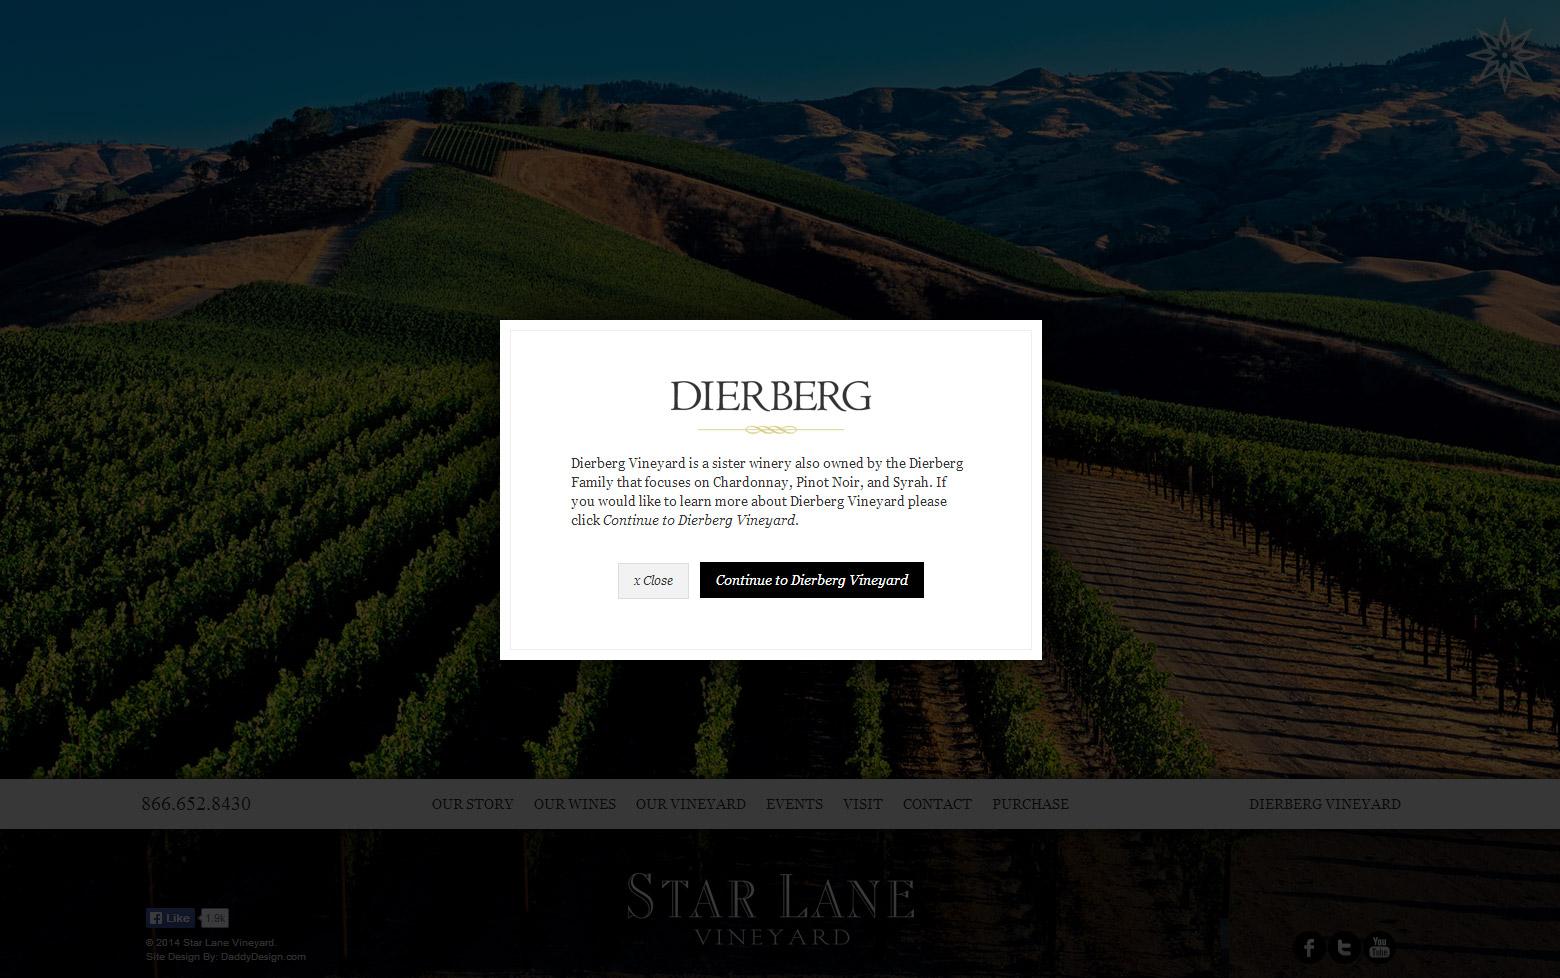 Lightbox to Exit to Dierberg Website